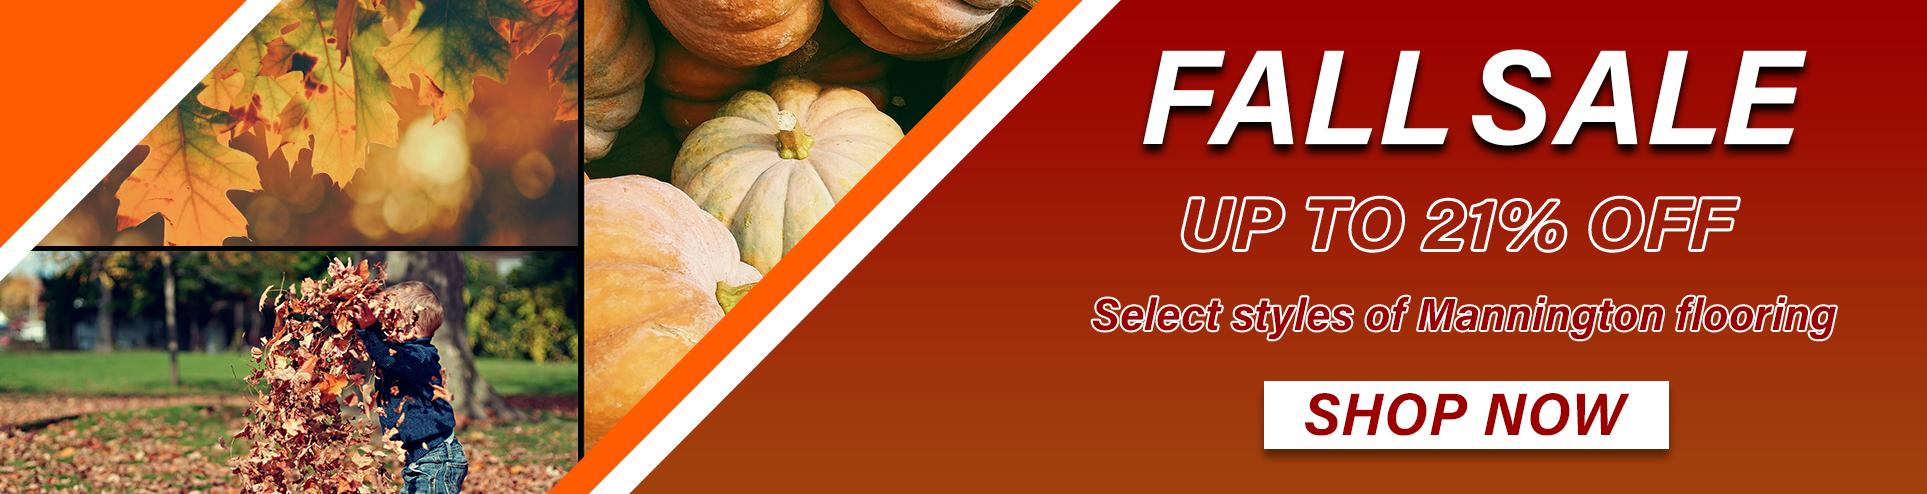 fall-sale-banner-mannington-sale.png